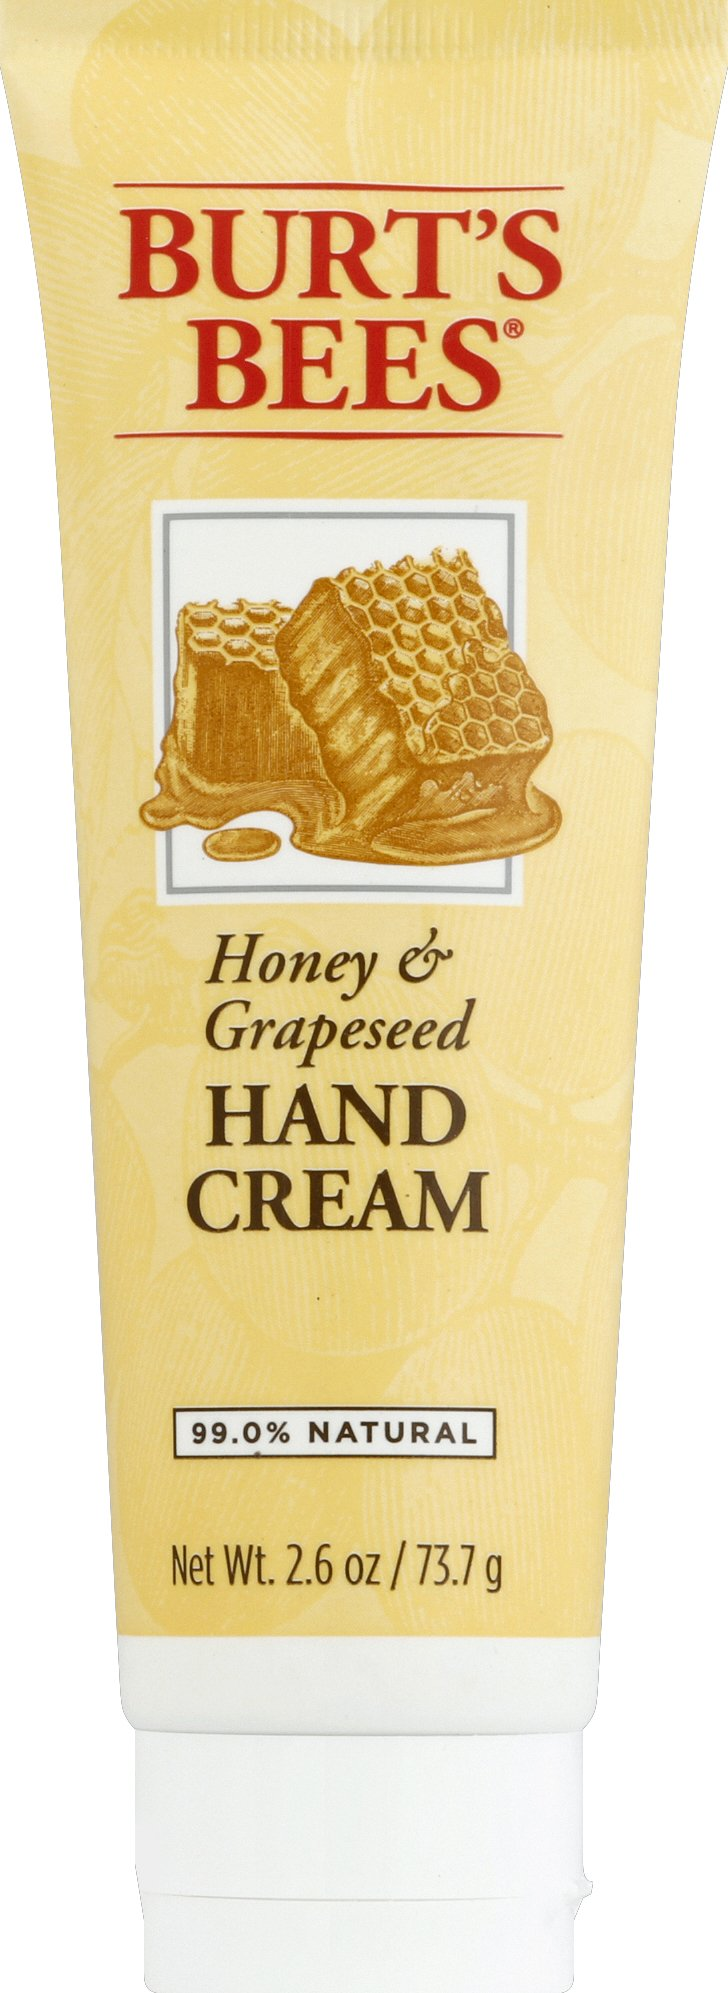 Burt's Bees Burts Bees Hand Cream Trio 3 X 1 Oz, 3count